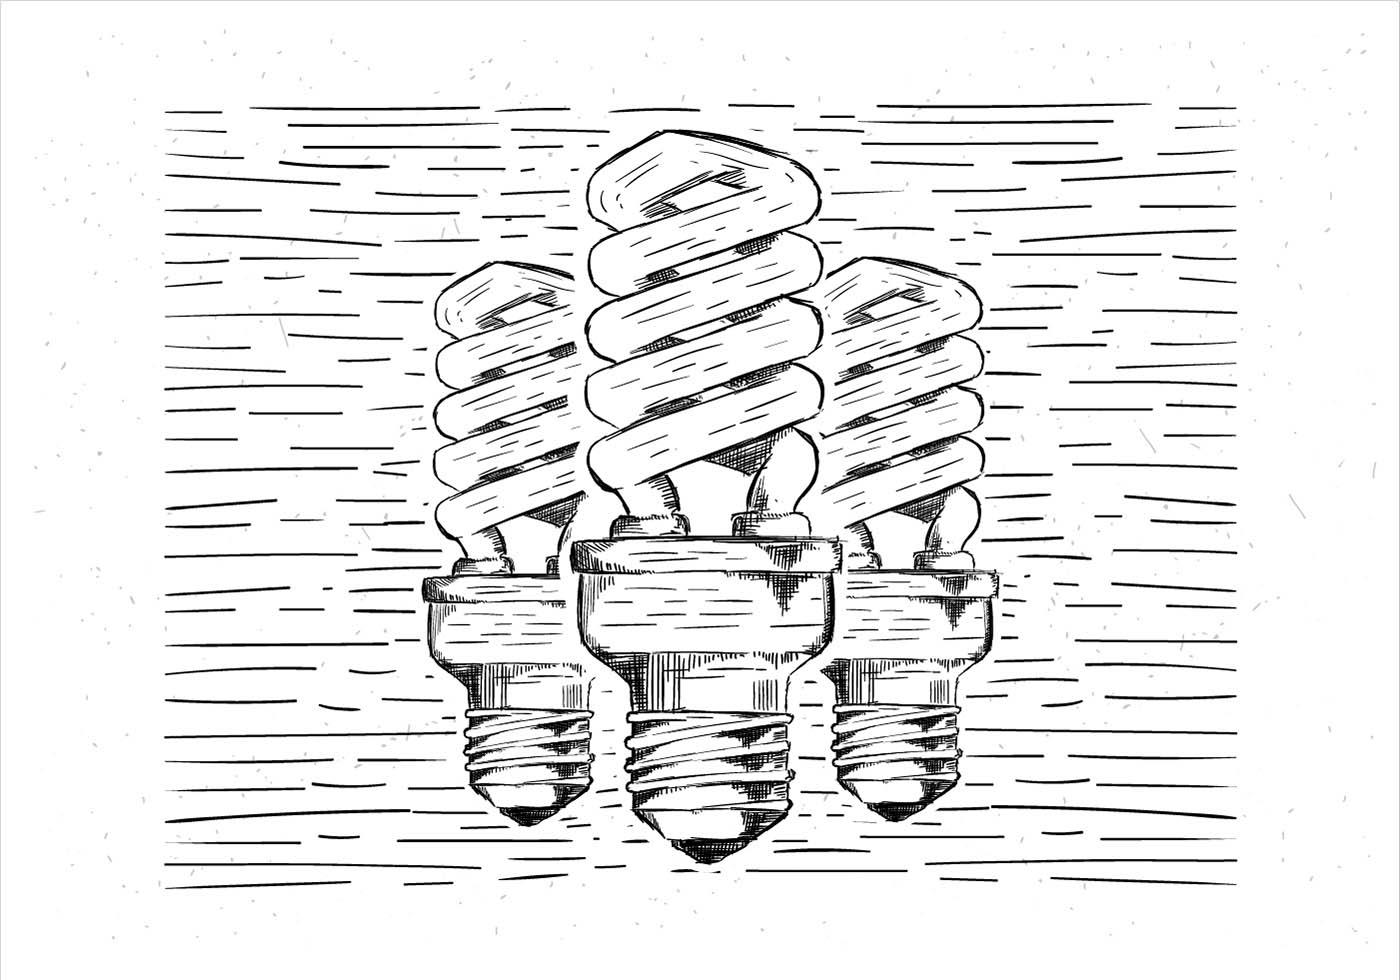 free vector hand drawn lightbulb illustration